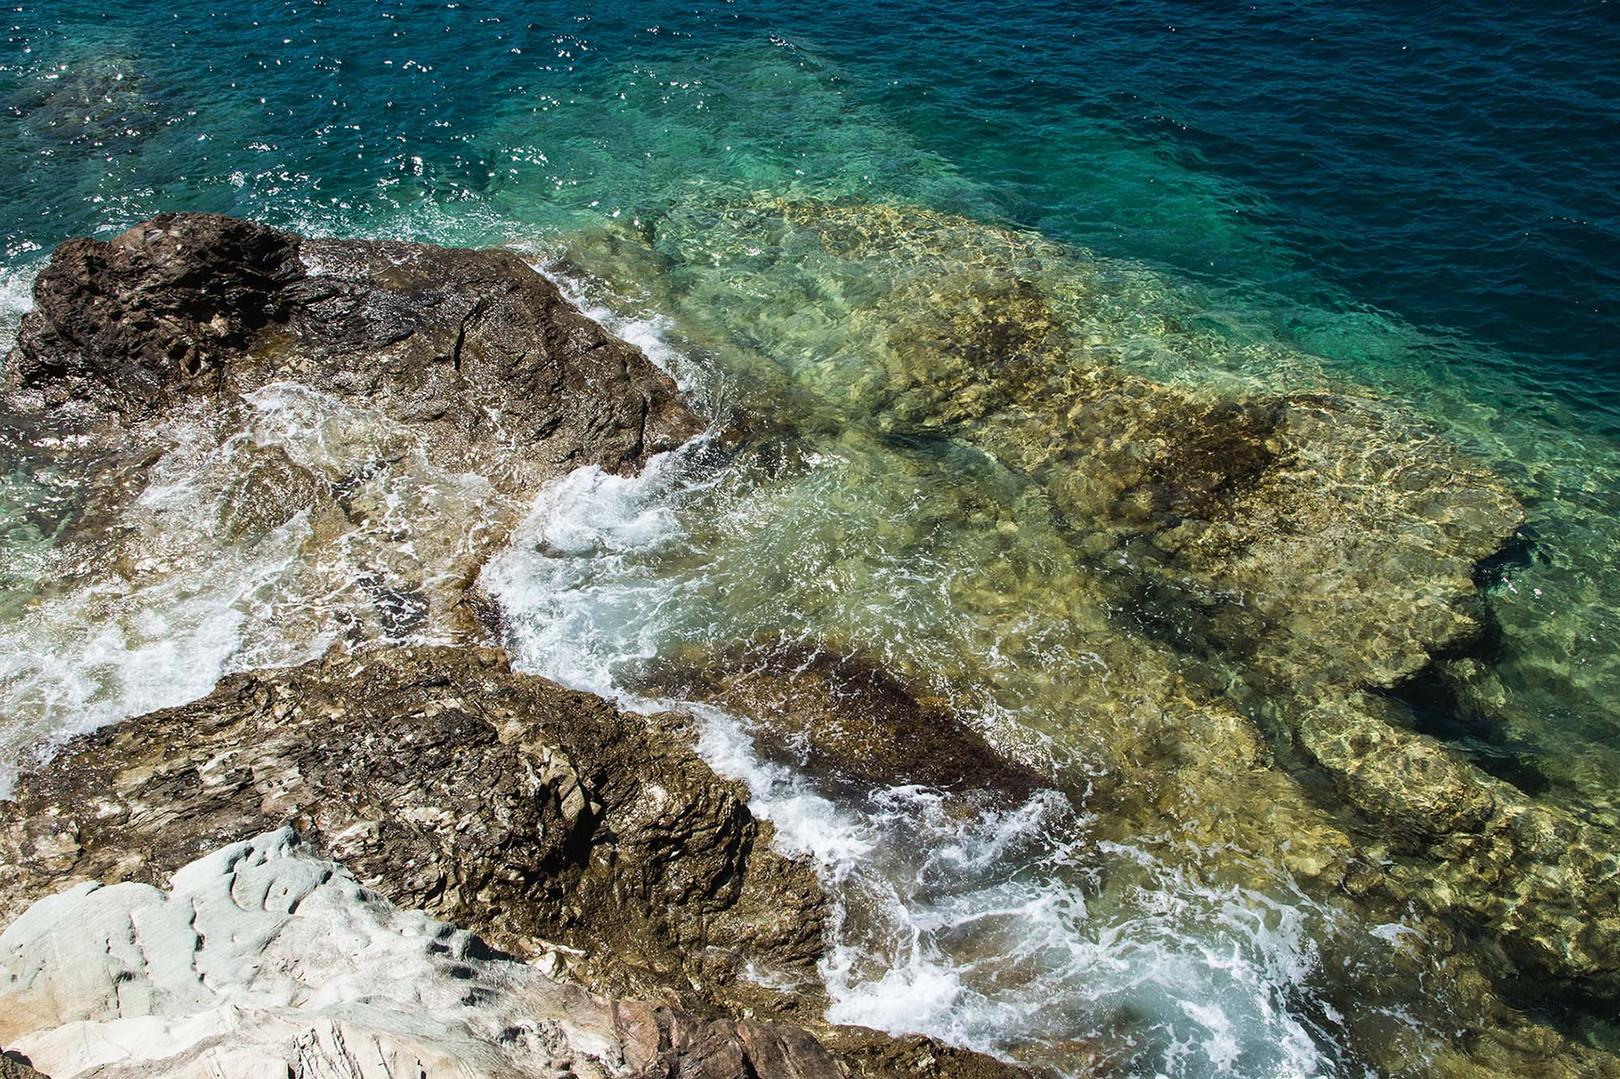 Mediterranean Sea in Greece